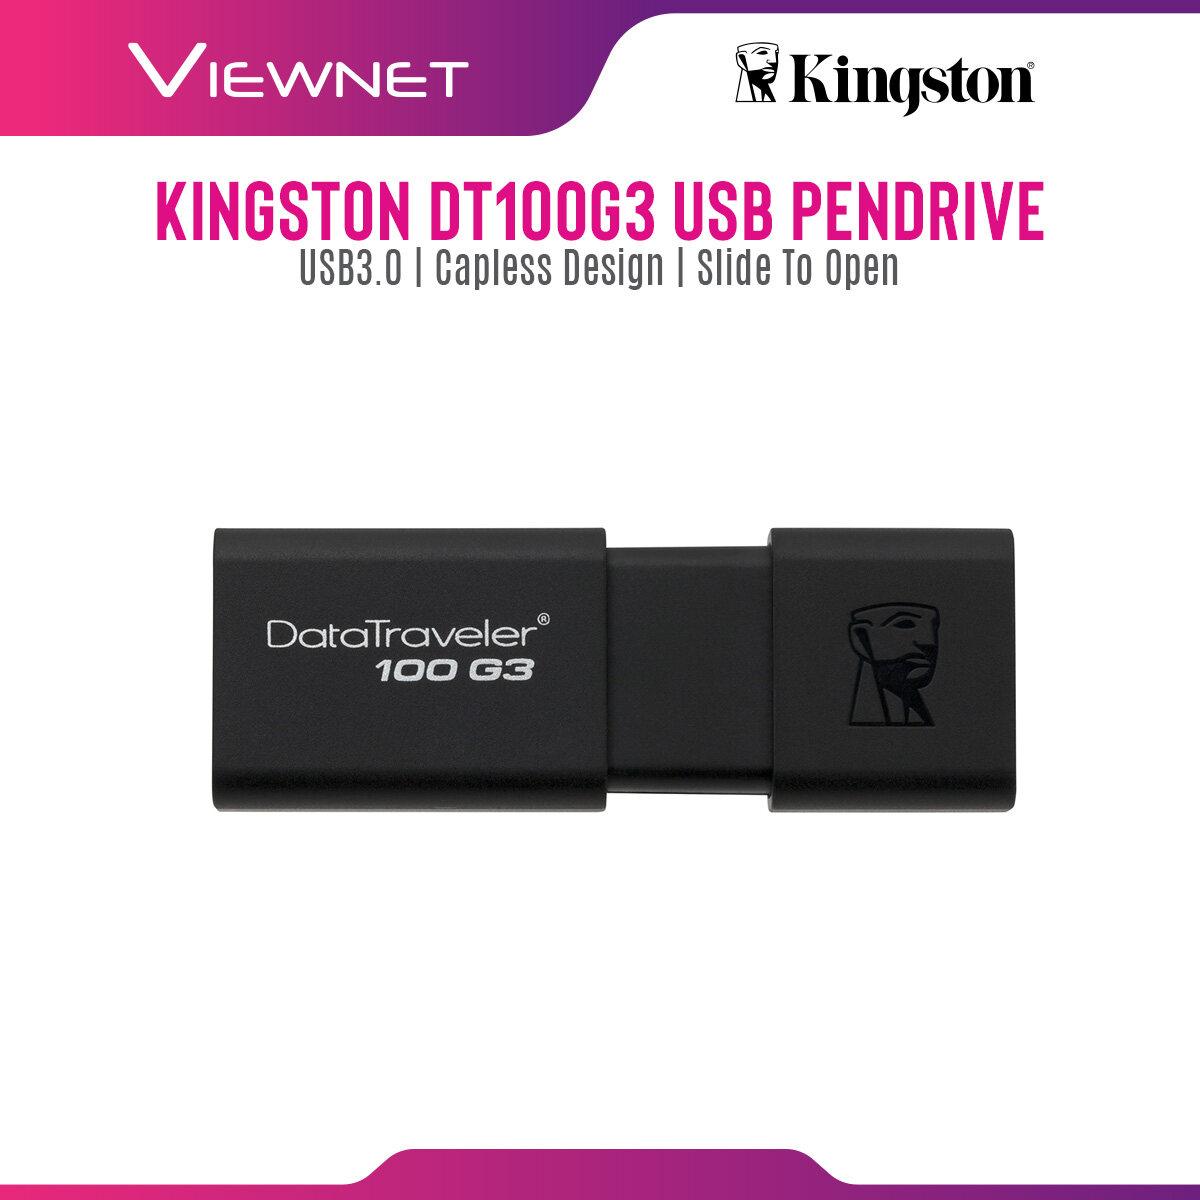 Kingston DataTraveler 100 G3 128GB Pendrive USB 3.1 Gen 1 (USB 3.0) Flash Drive (DT100G3) USB 2.0 Compatible Windows & Mac Compatible Five-Year Warranty Stylish Black-on-Black Sliding Cap Design Pendrive